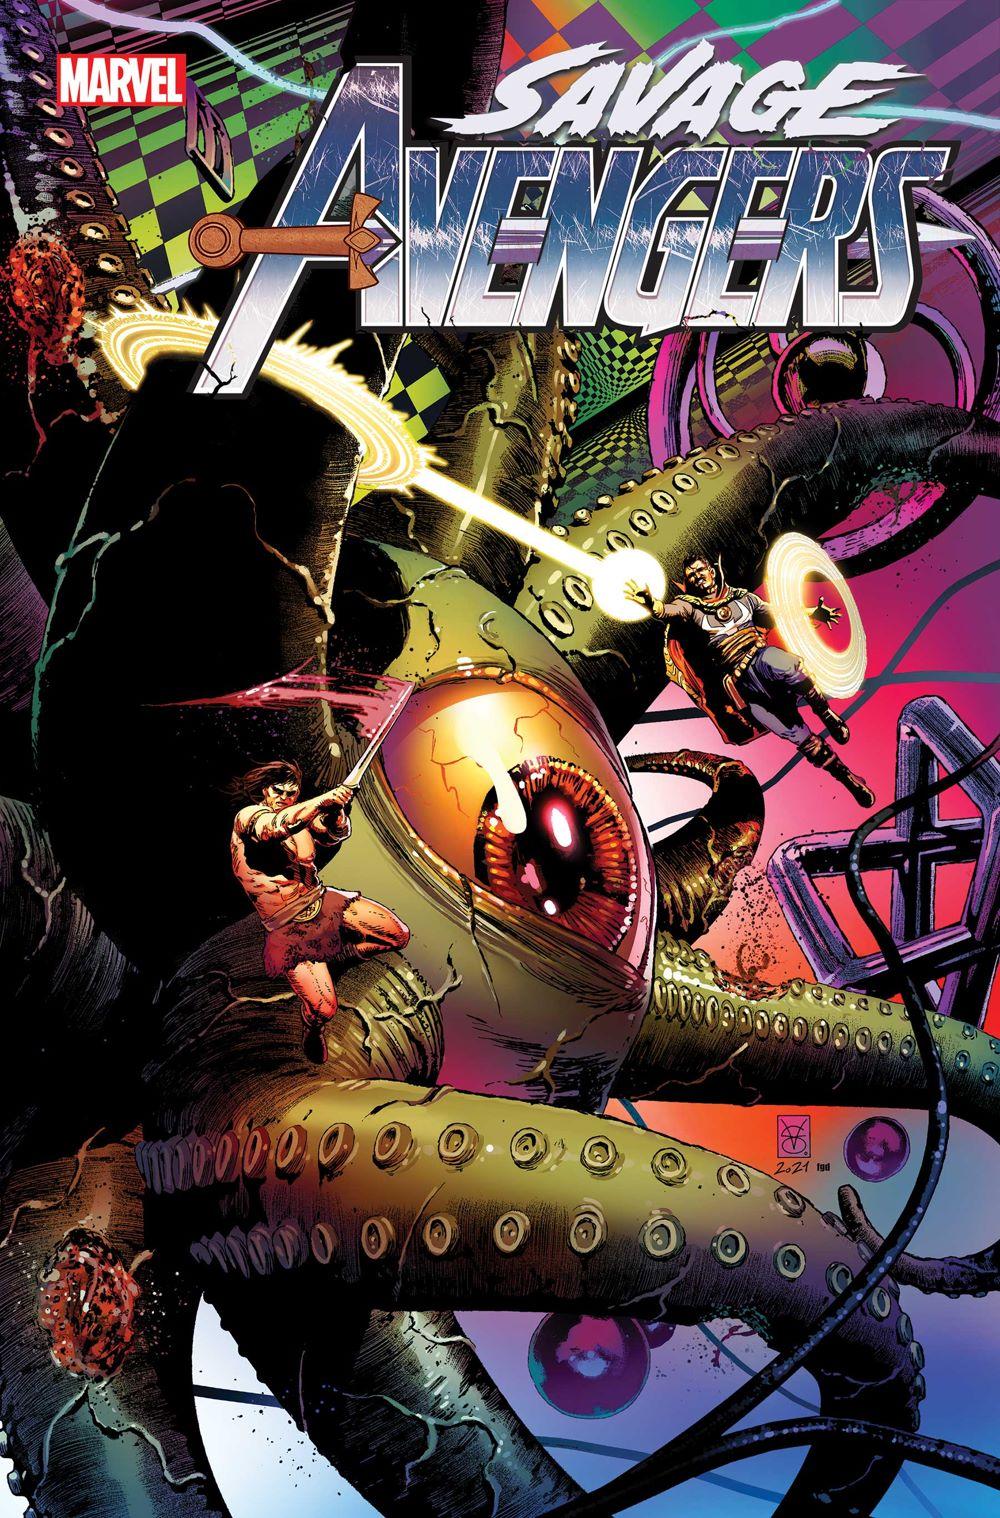 SAVAVEN2019023_Cov Marvel Comics August 2021 Solicitations